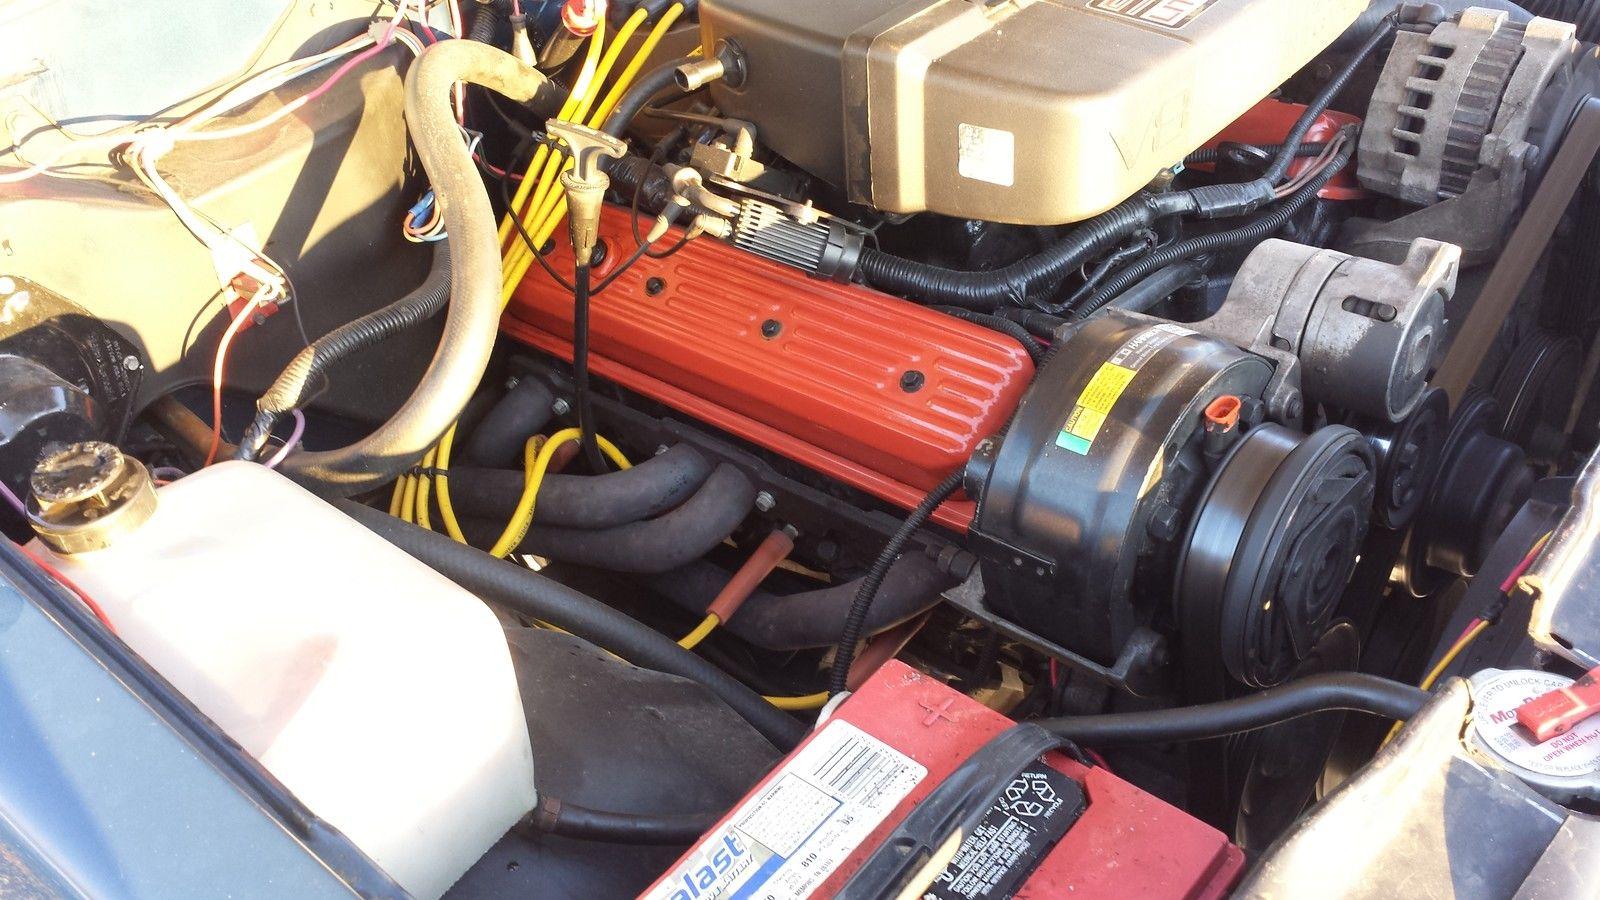 1992 Chevy S10 Fuse Box Diagram Image Details